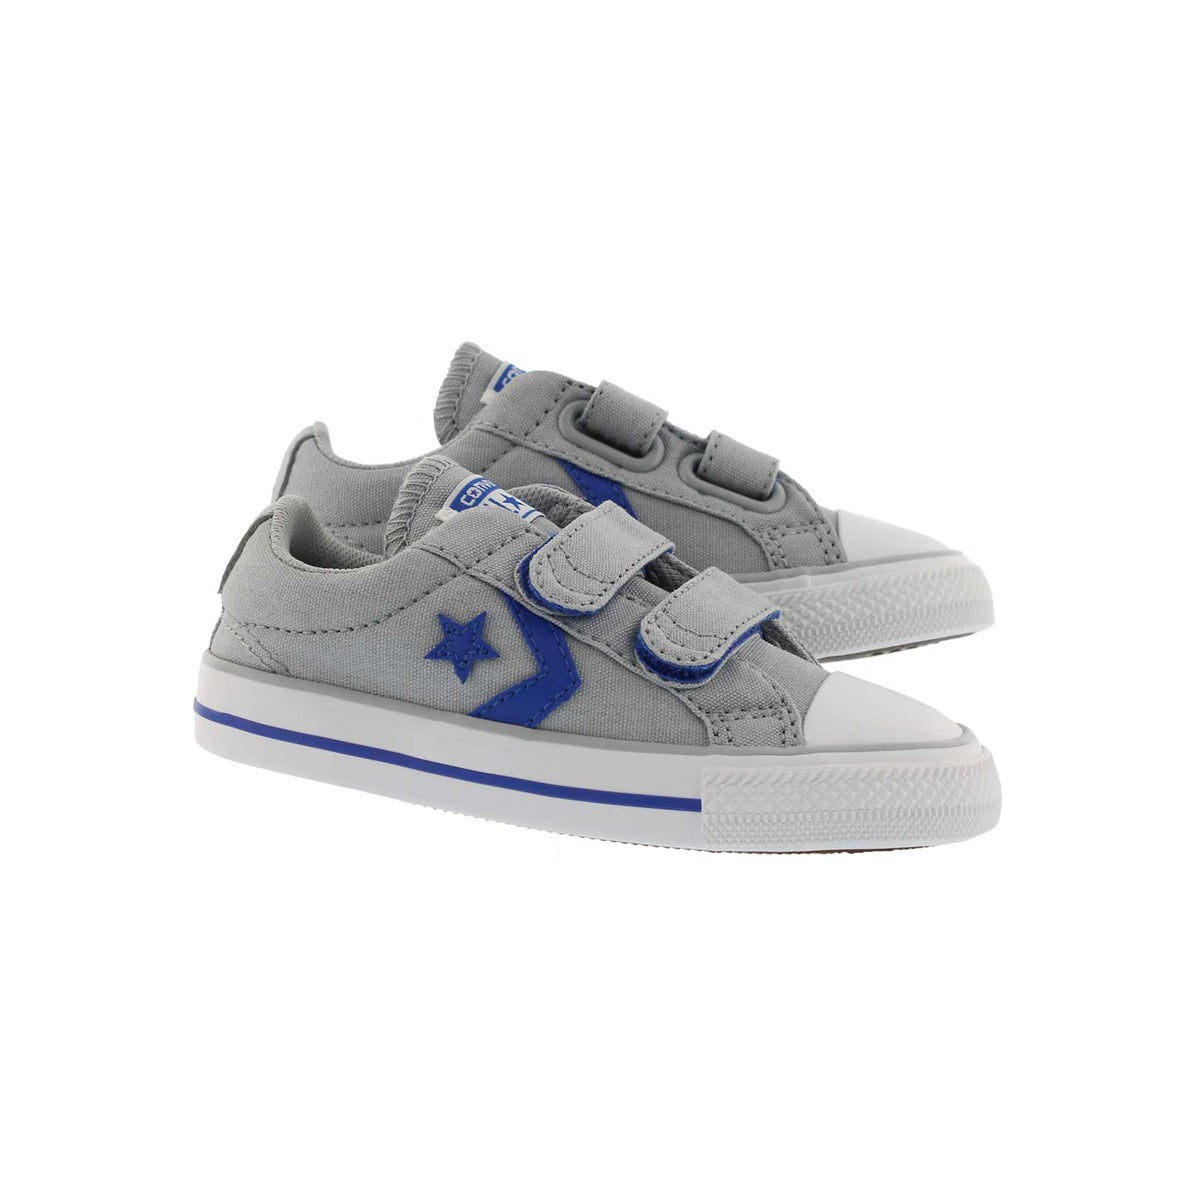 Infs-b Star Player 2V gry/blu/wt sneaker